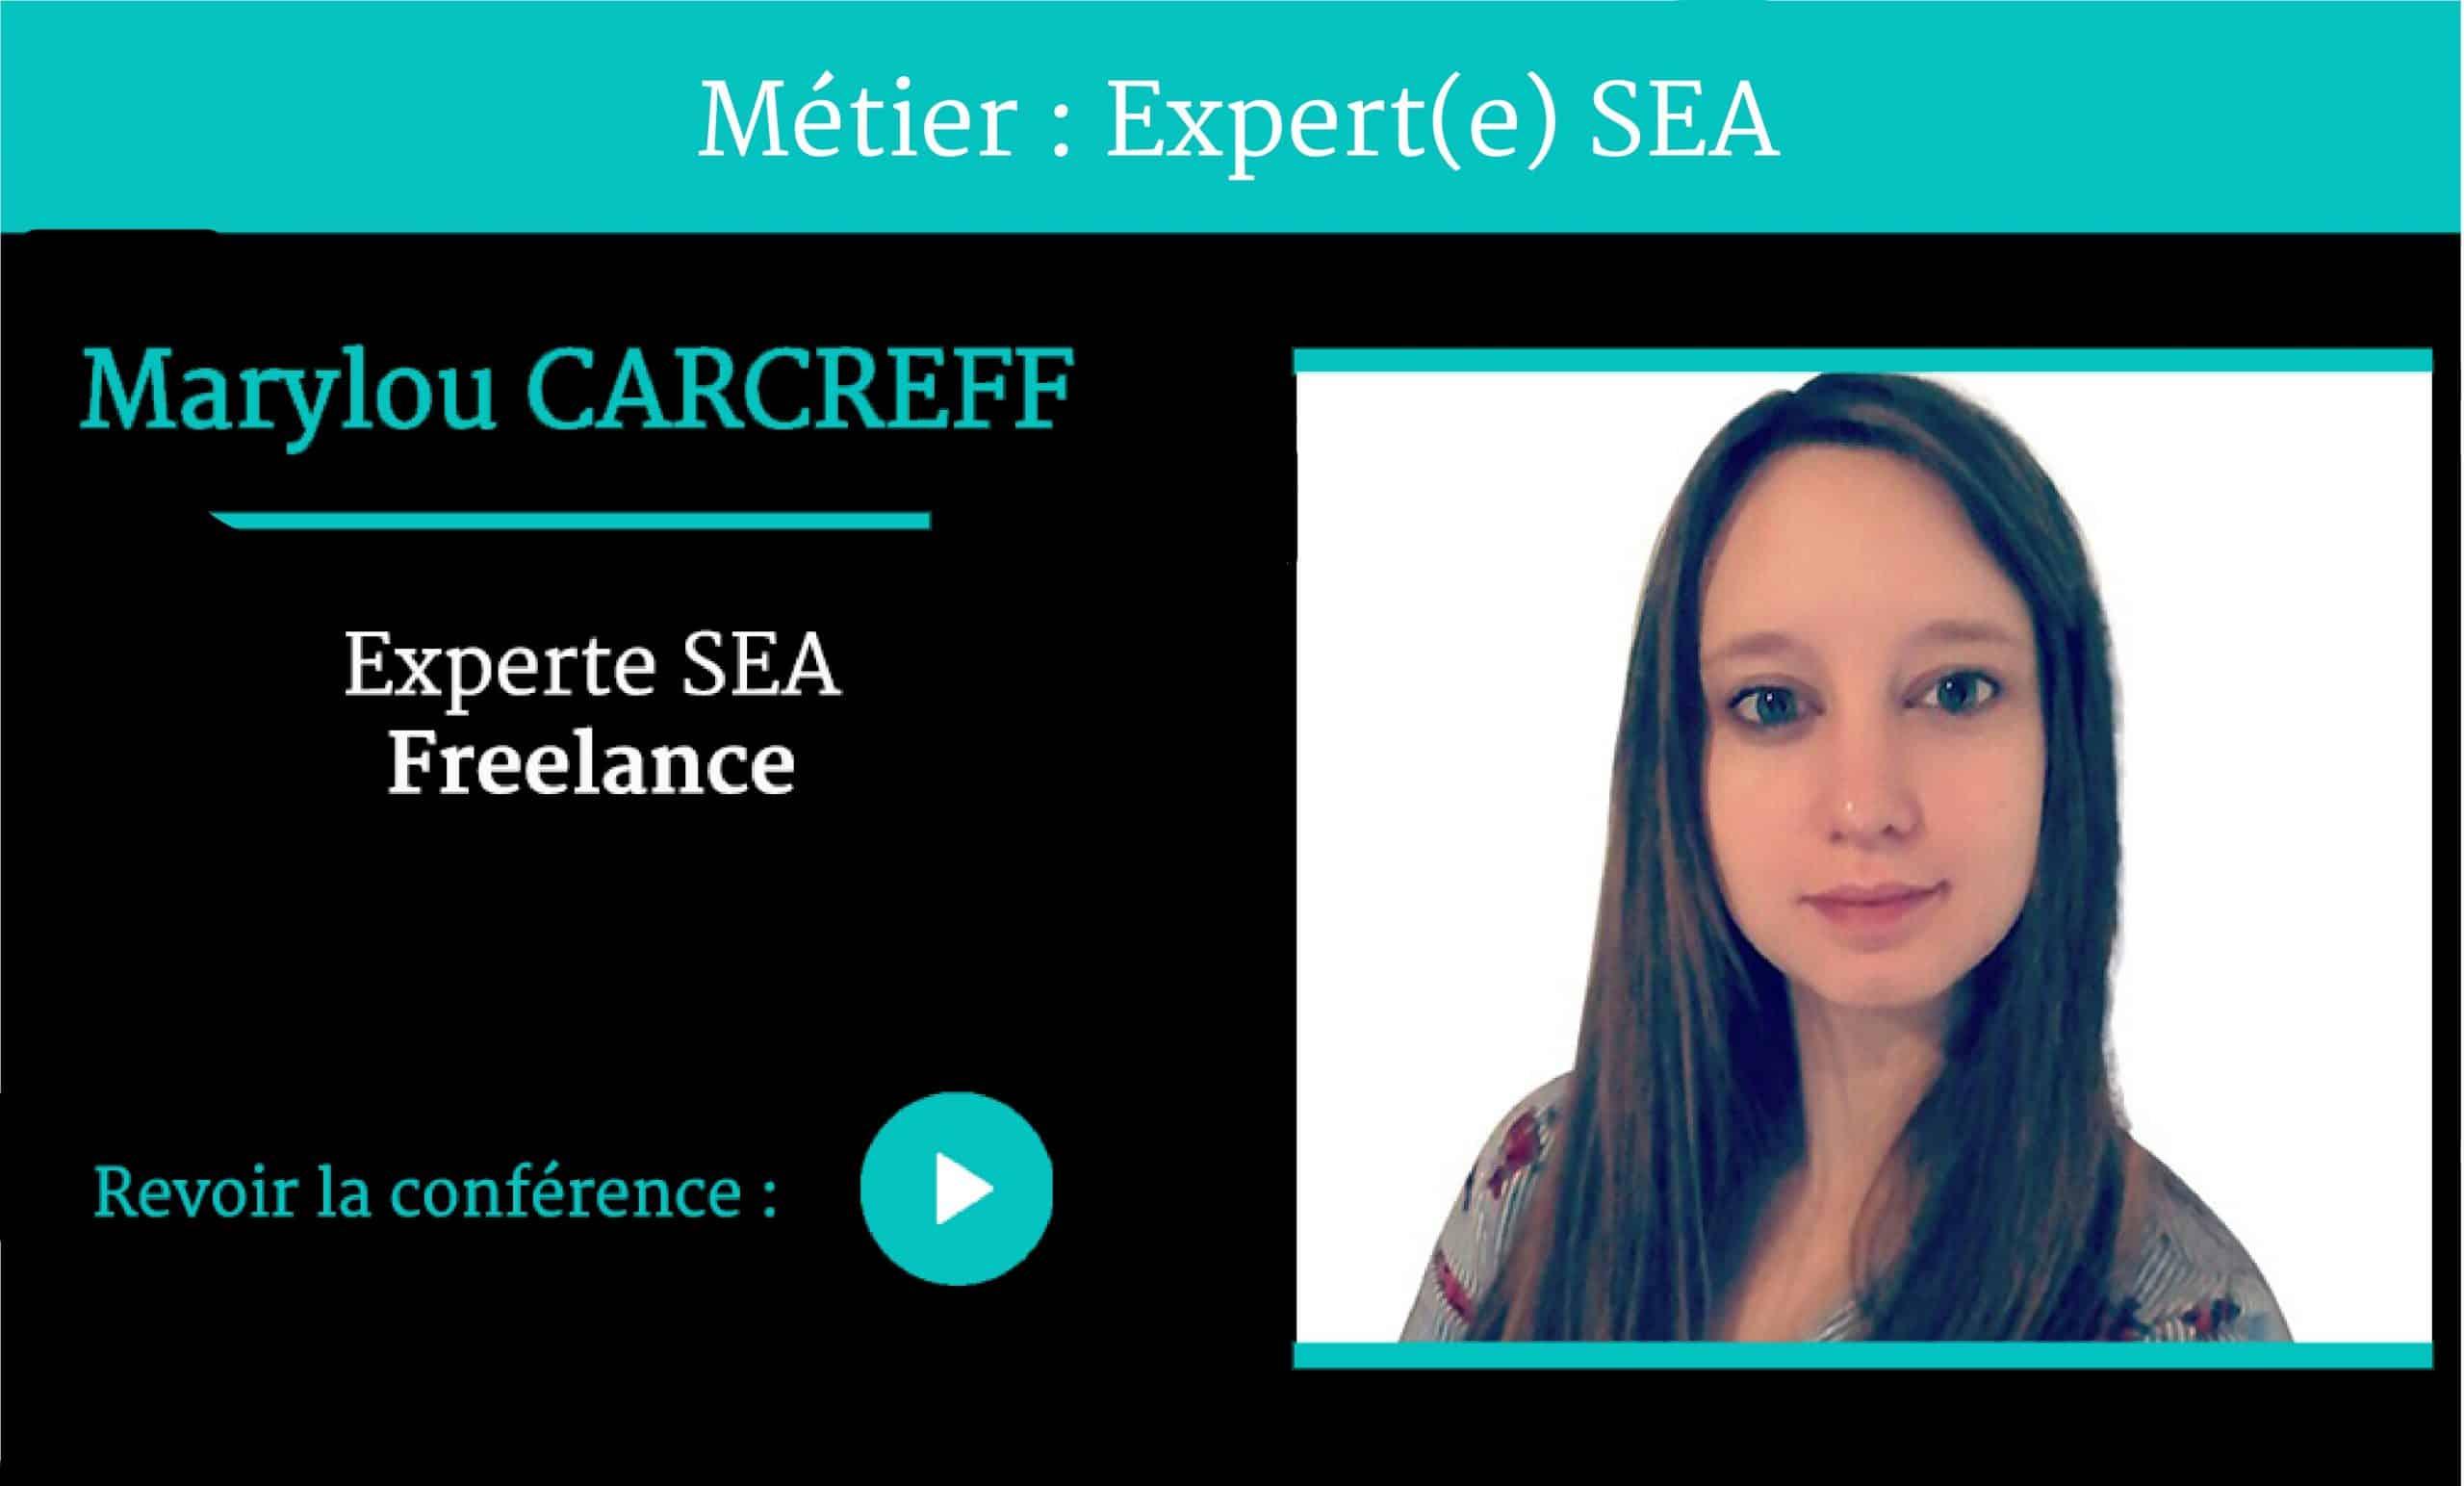 Métier Expert SEA conférence par Marylou CARCREFF pour Naïas – National Institute of Advertising Strategy